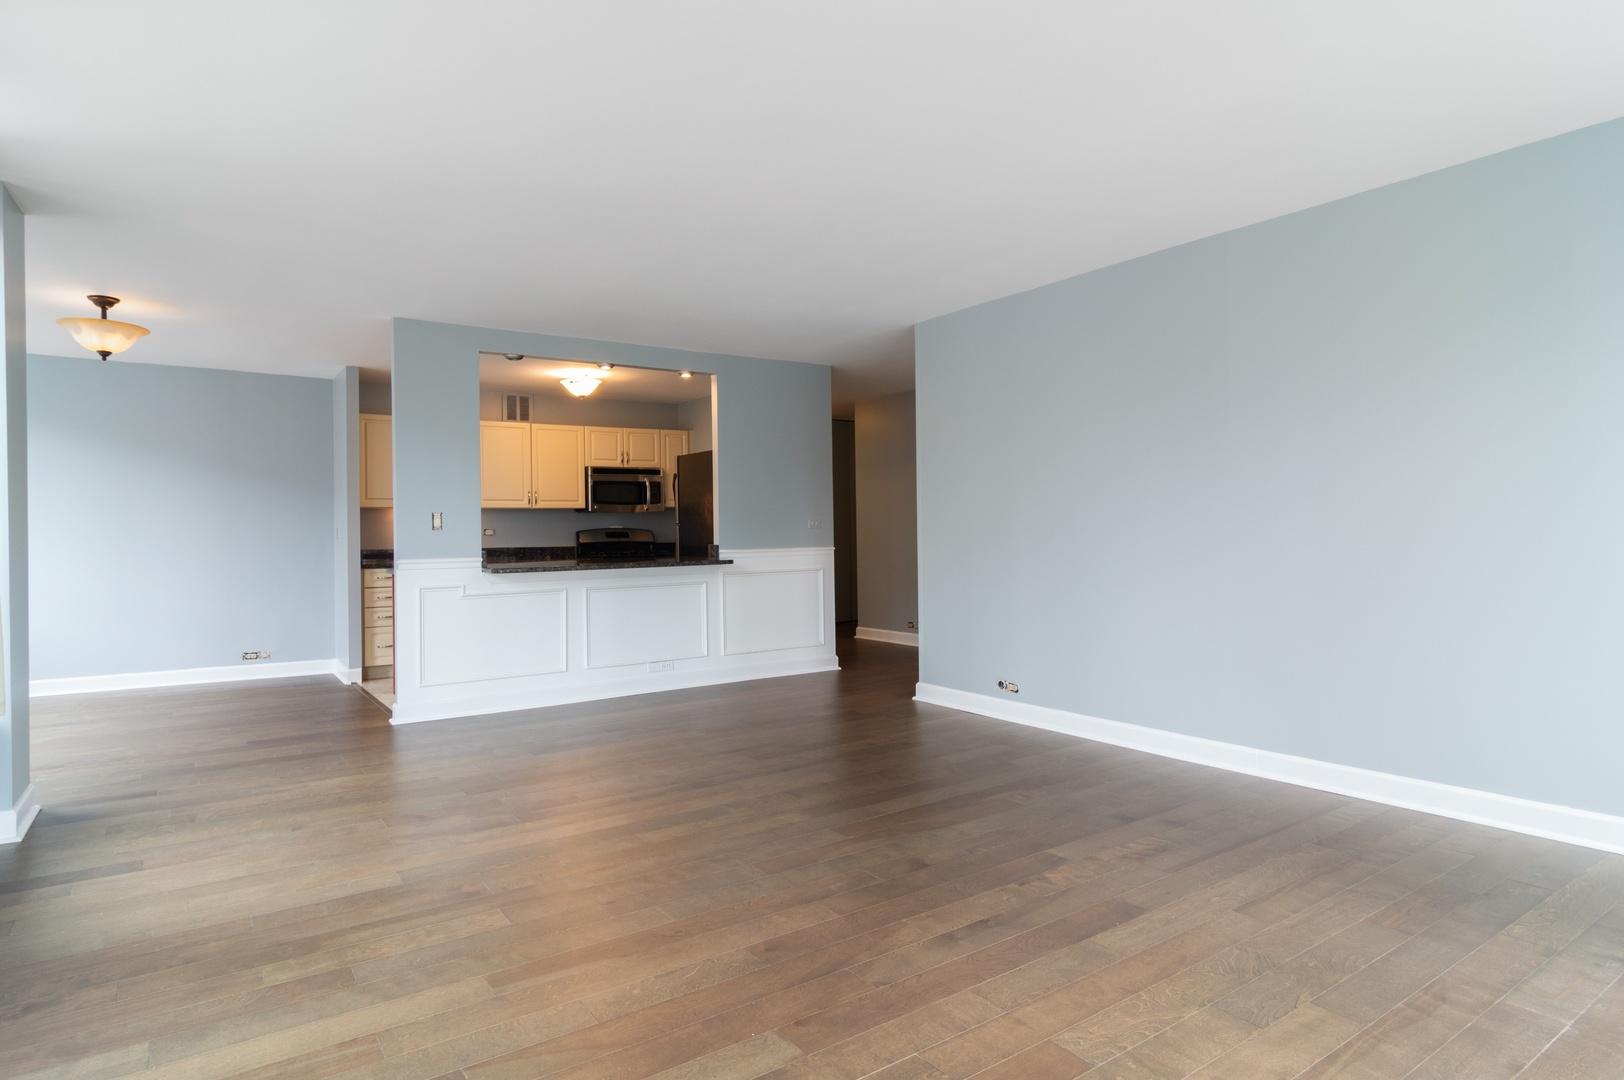 Hd 1561122886390 05 2800nlakeshoredr 817 93001 livingroomdiningroom hires